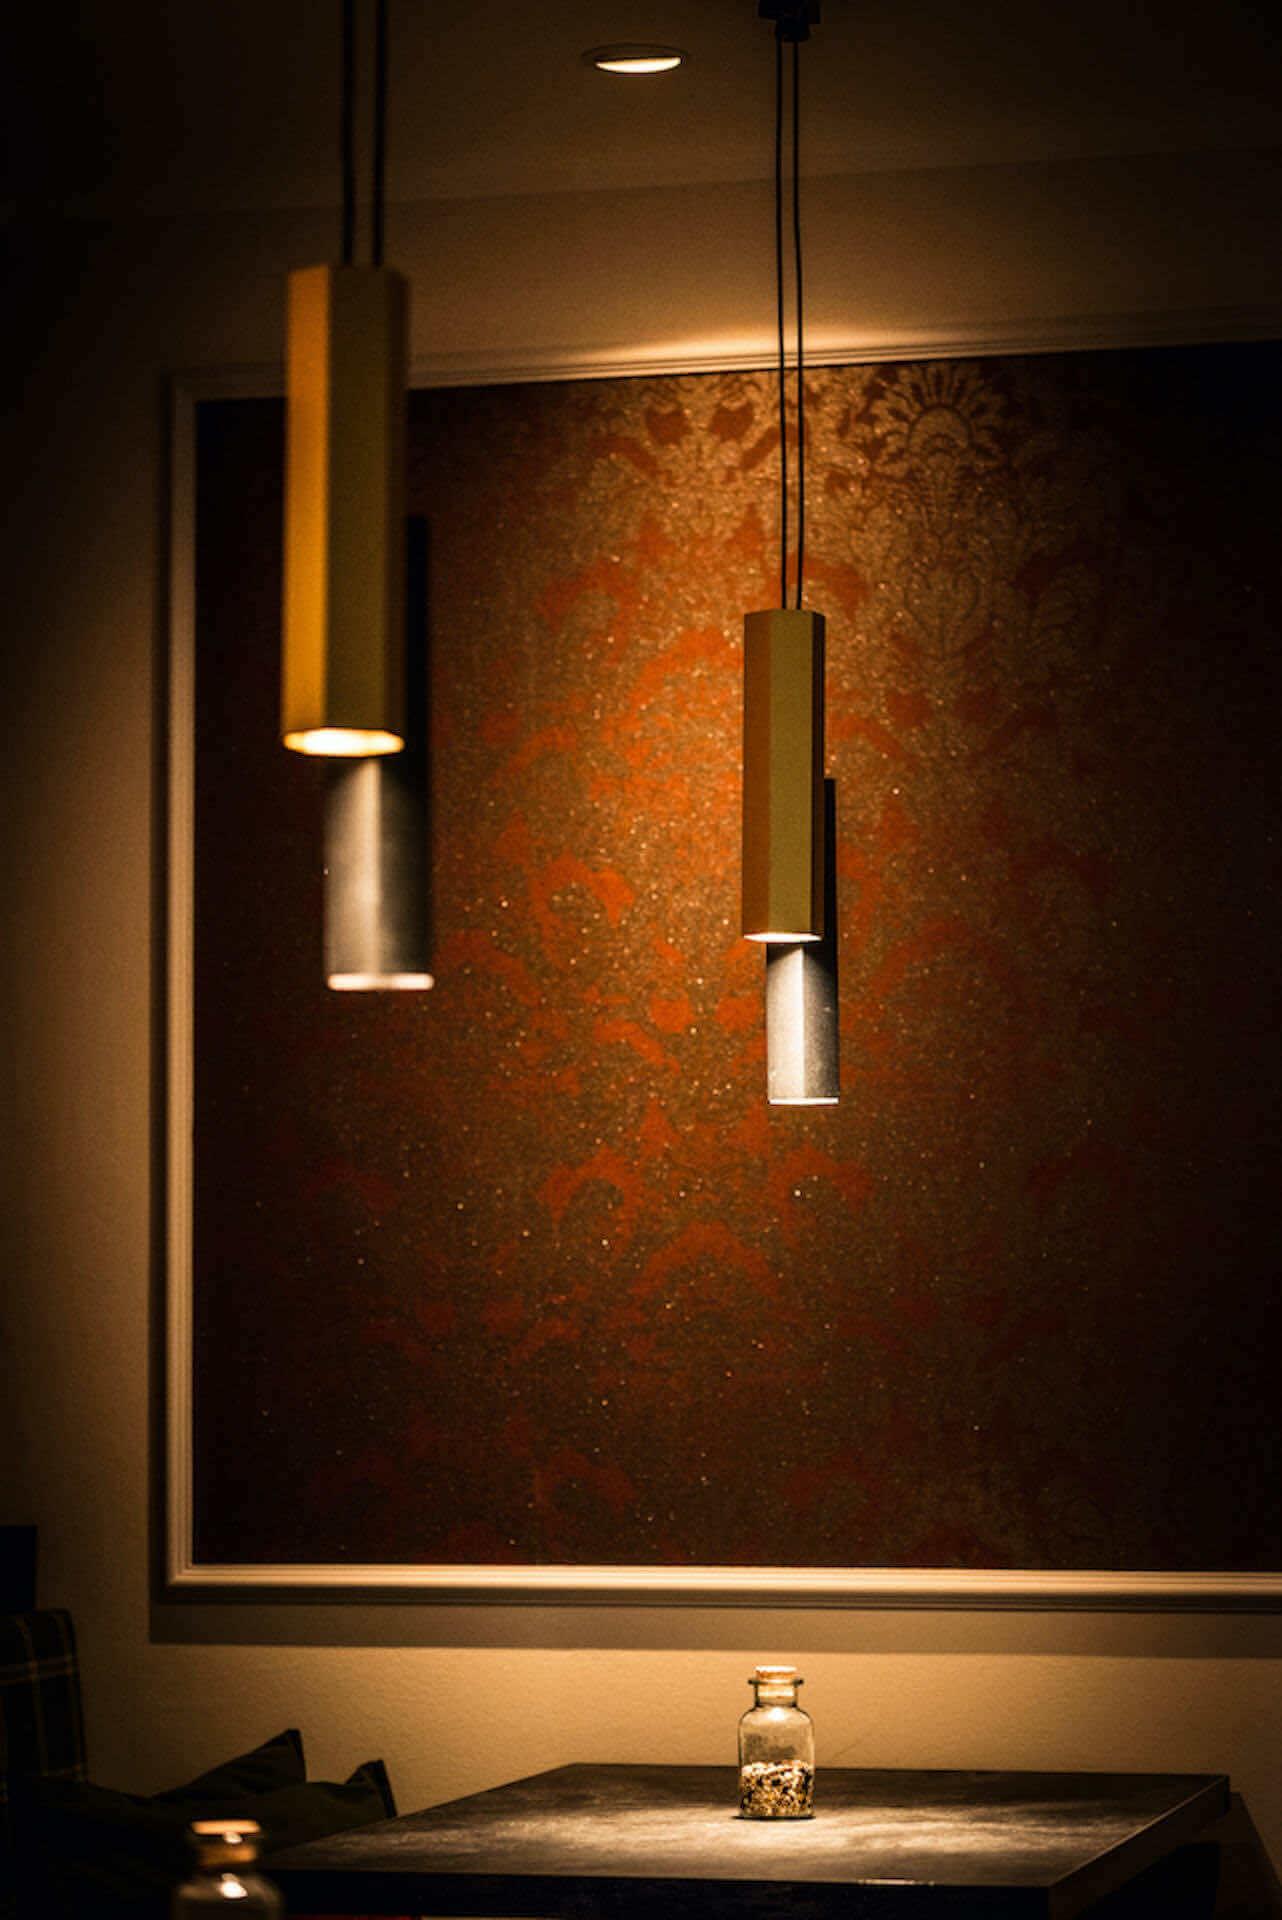 Akzentbeleuchtung Tisch | Schienensystem Wever & Ducré | Leuchten Lukassen